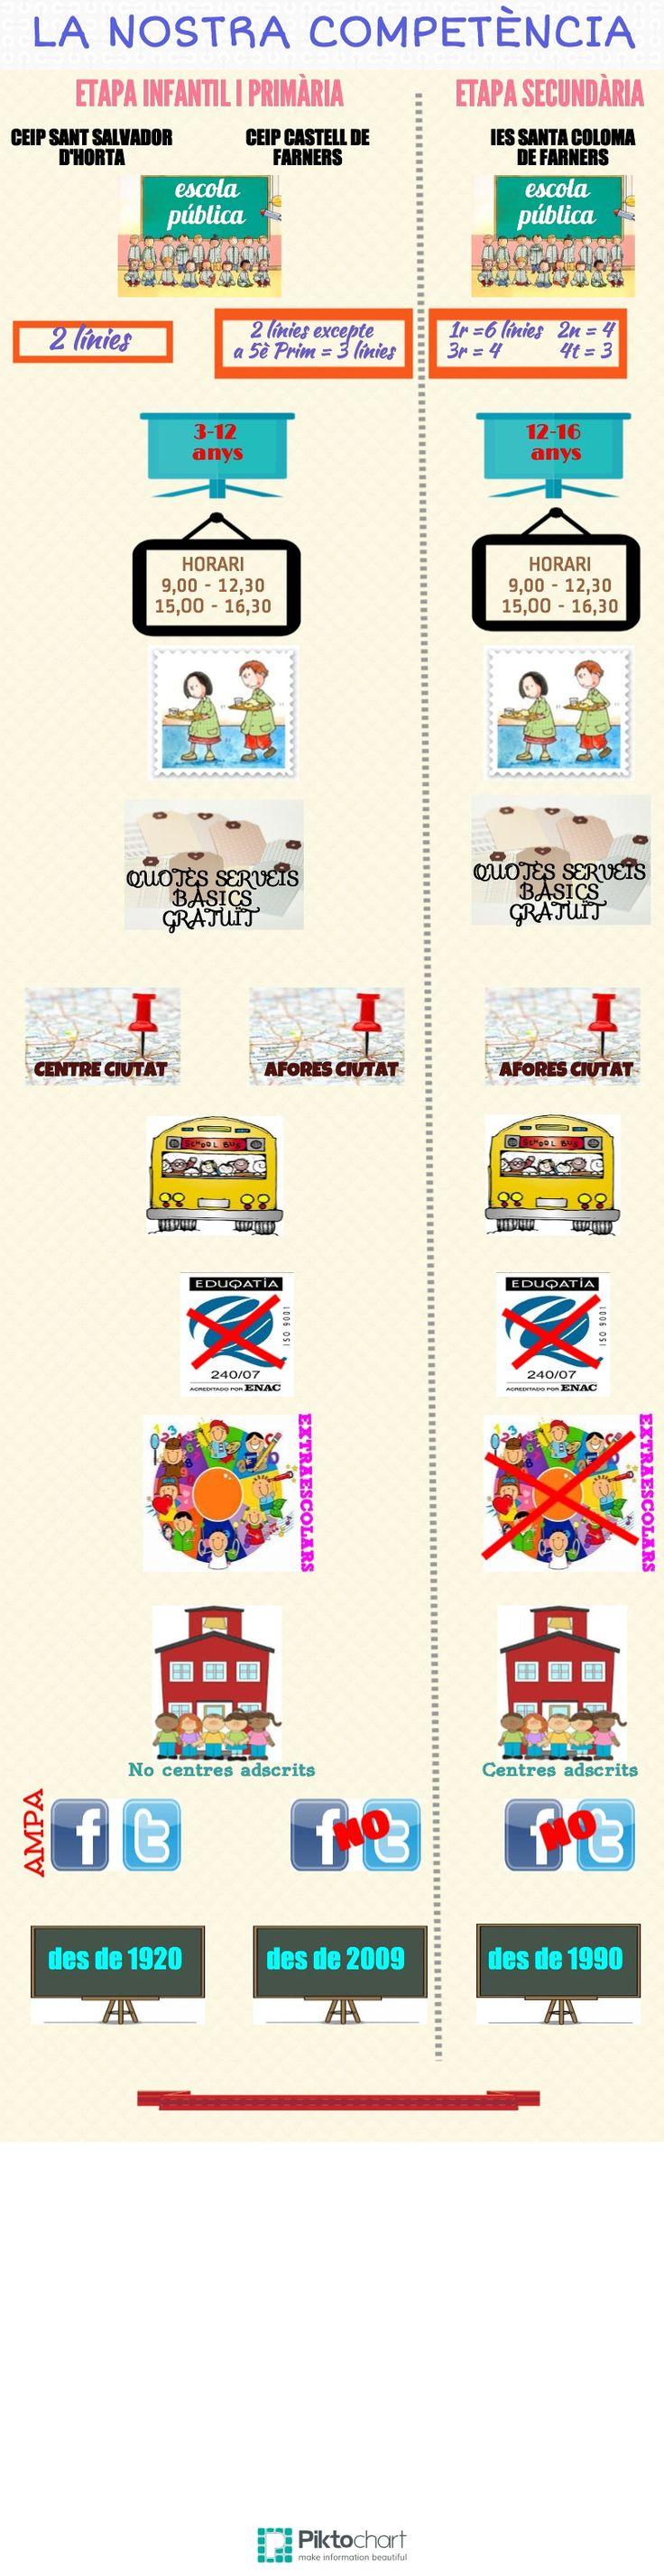 Competència | Piktochart Infographic Editor